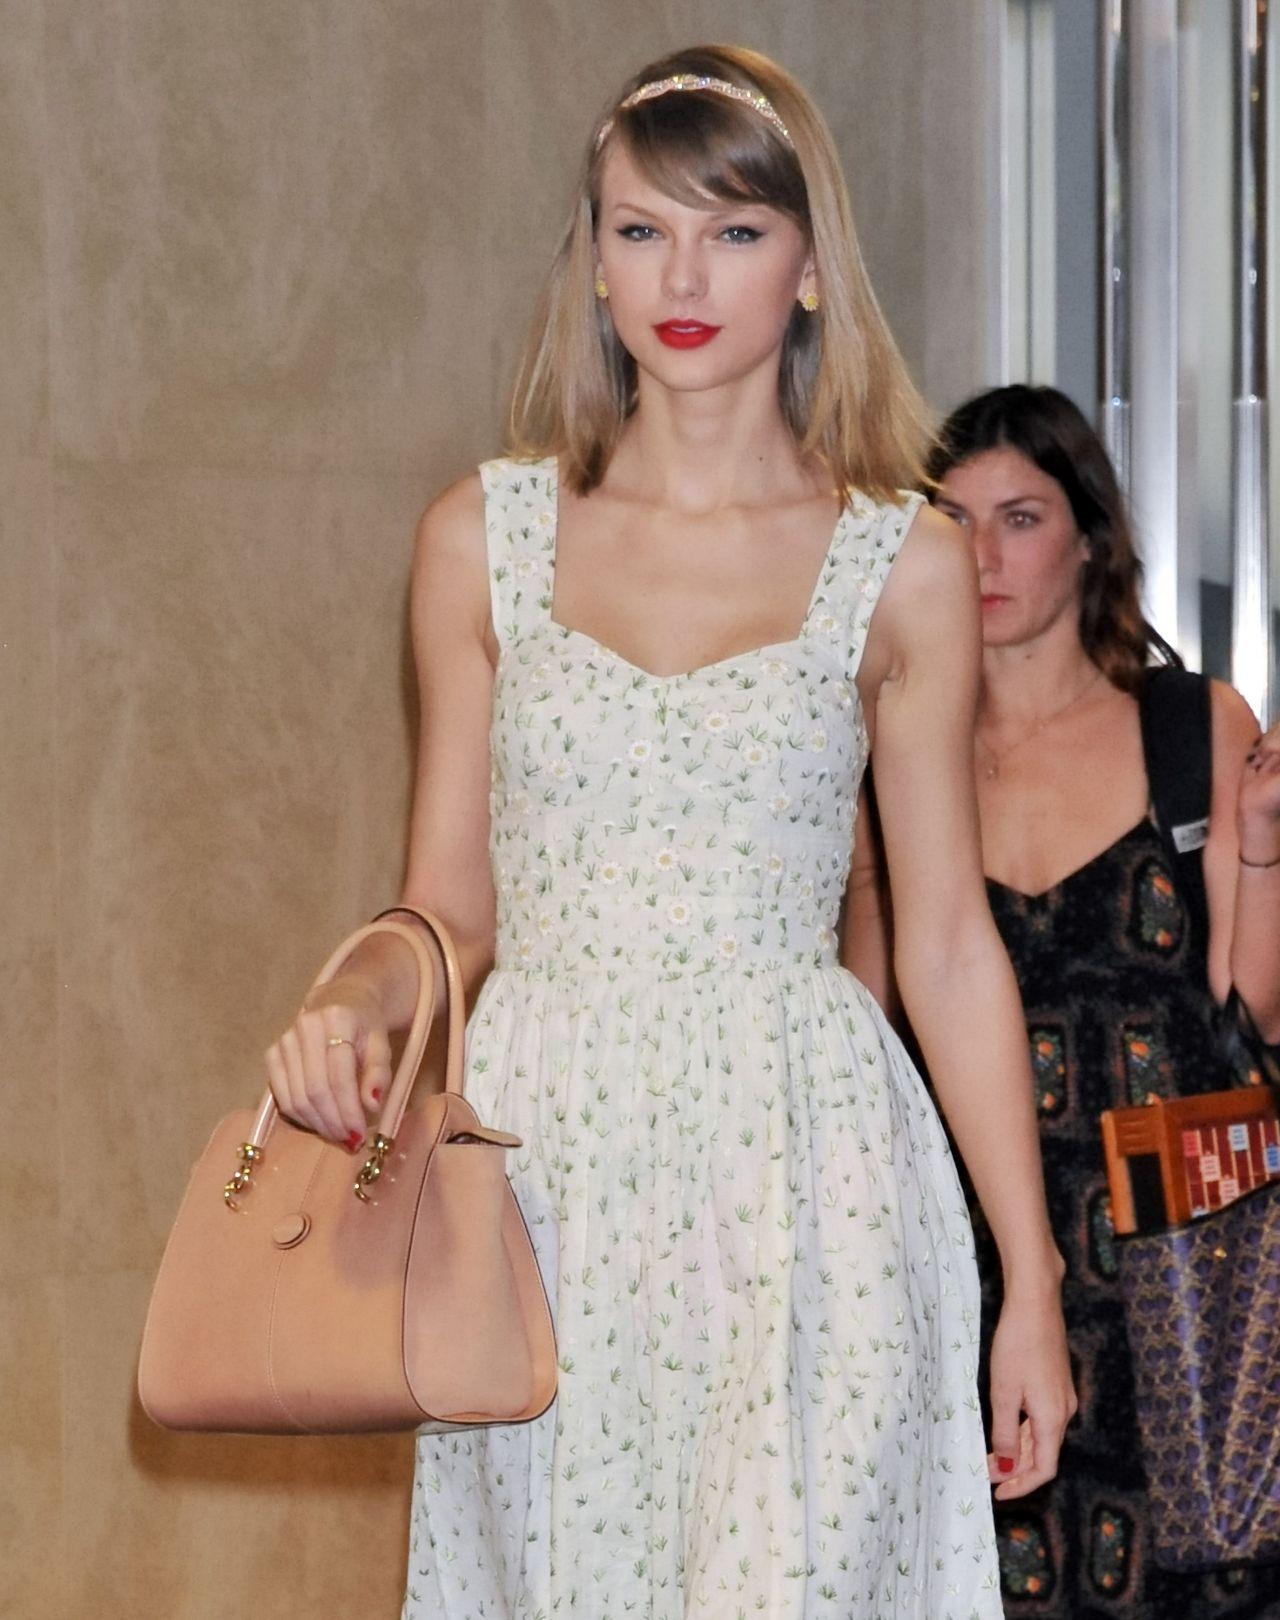 Taylor Swift Performing in Shanghai - May 2014 |Taylor Swift May 2014